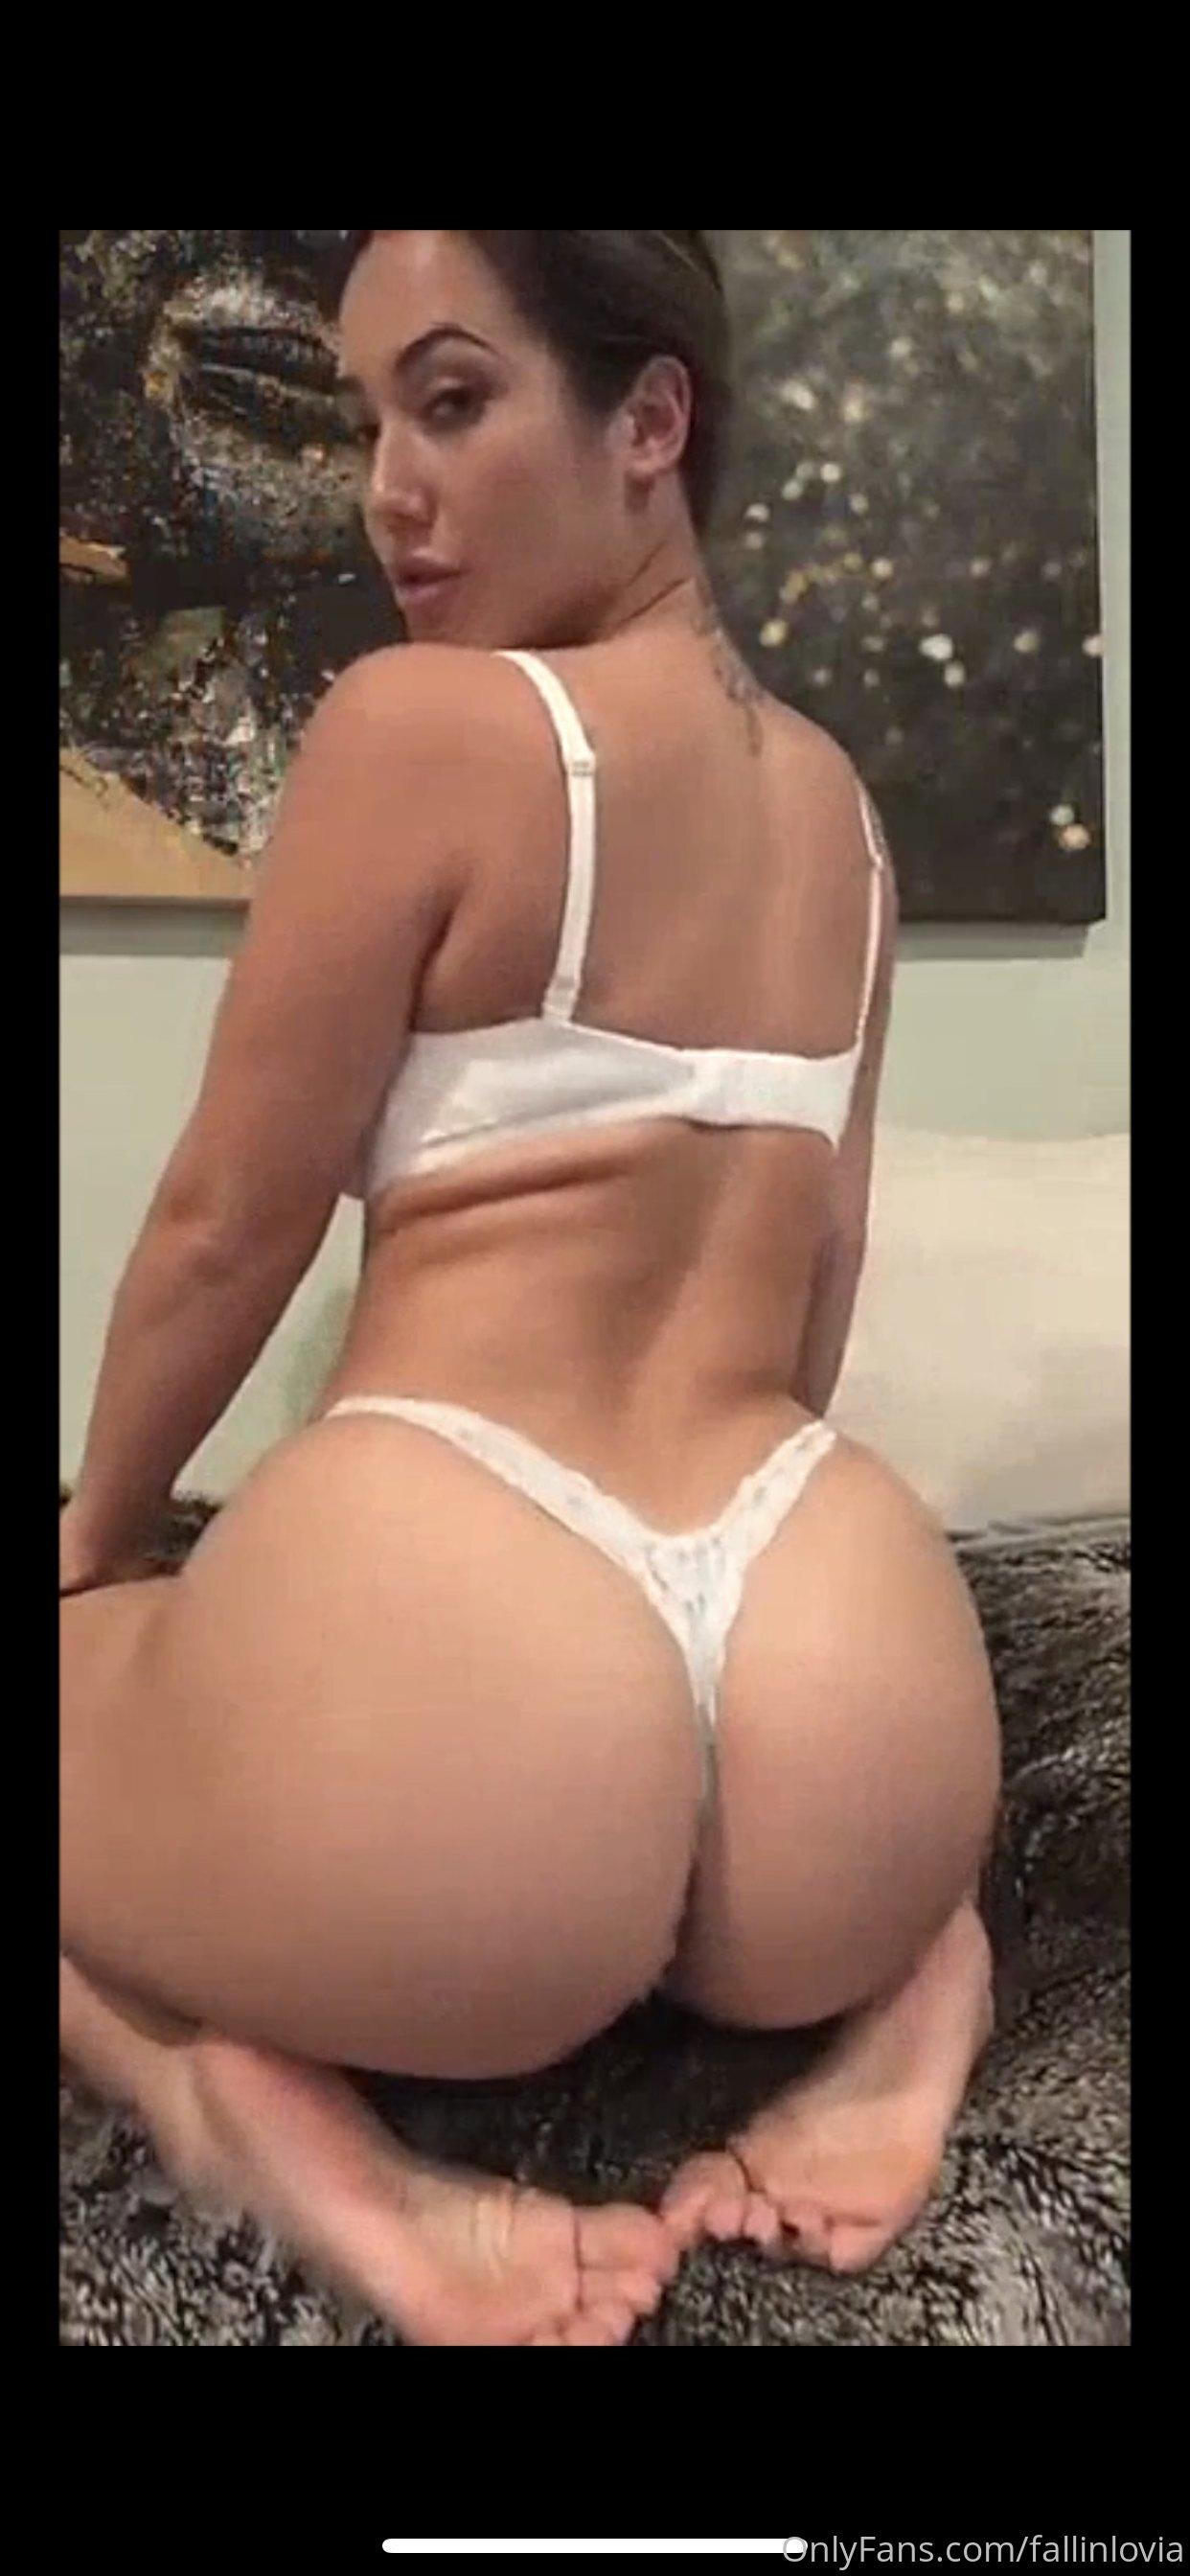 Eva Lovia, Fallinlovia, Onlyfans 0162